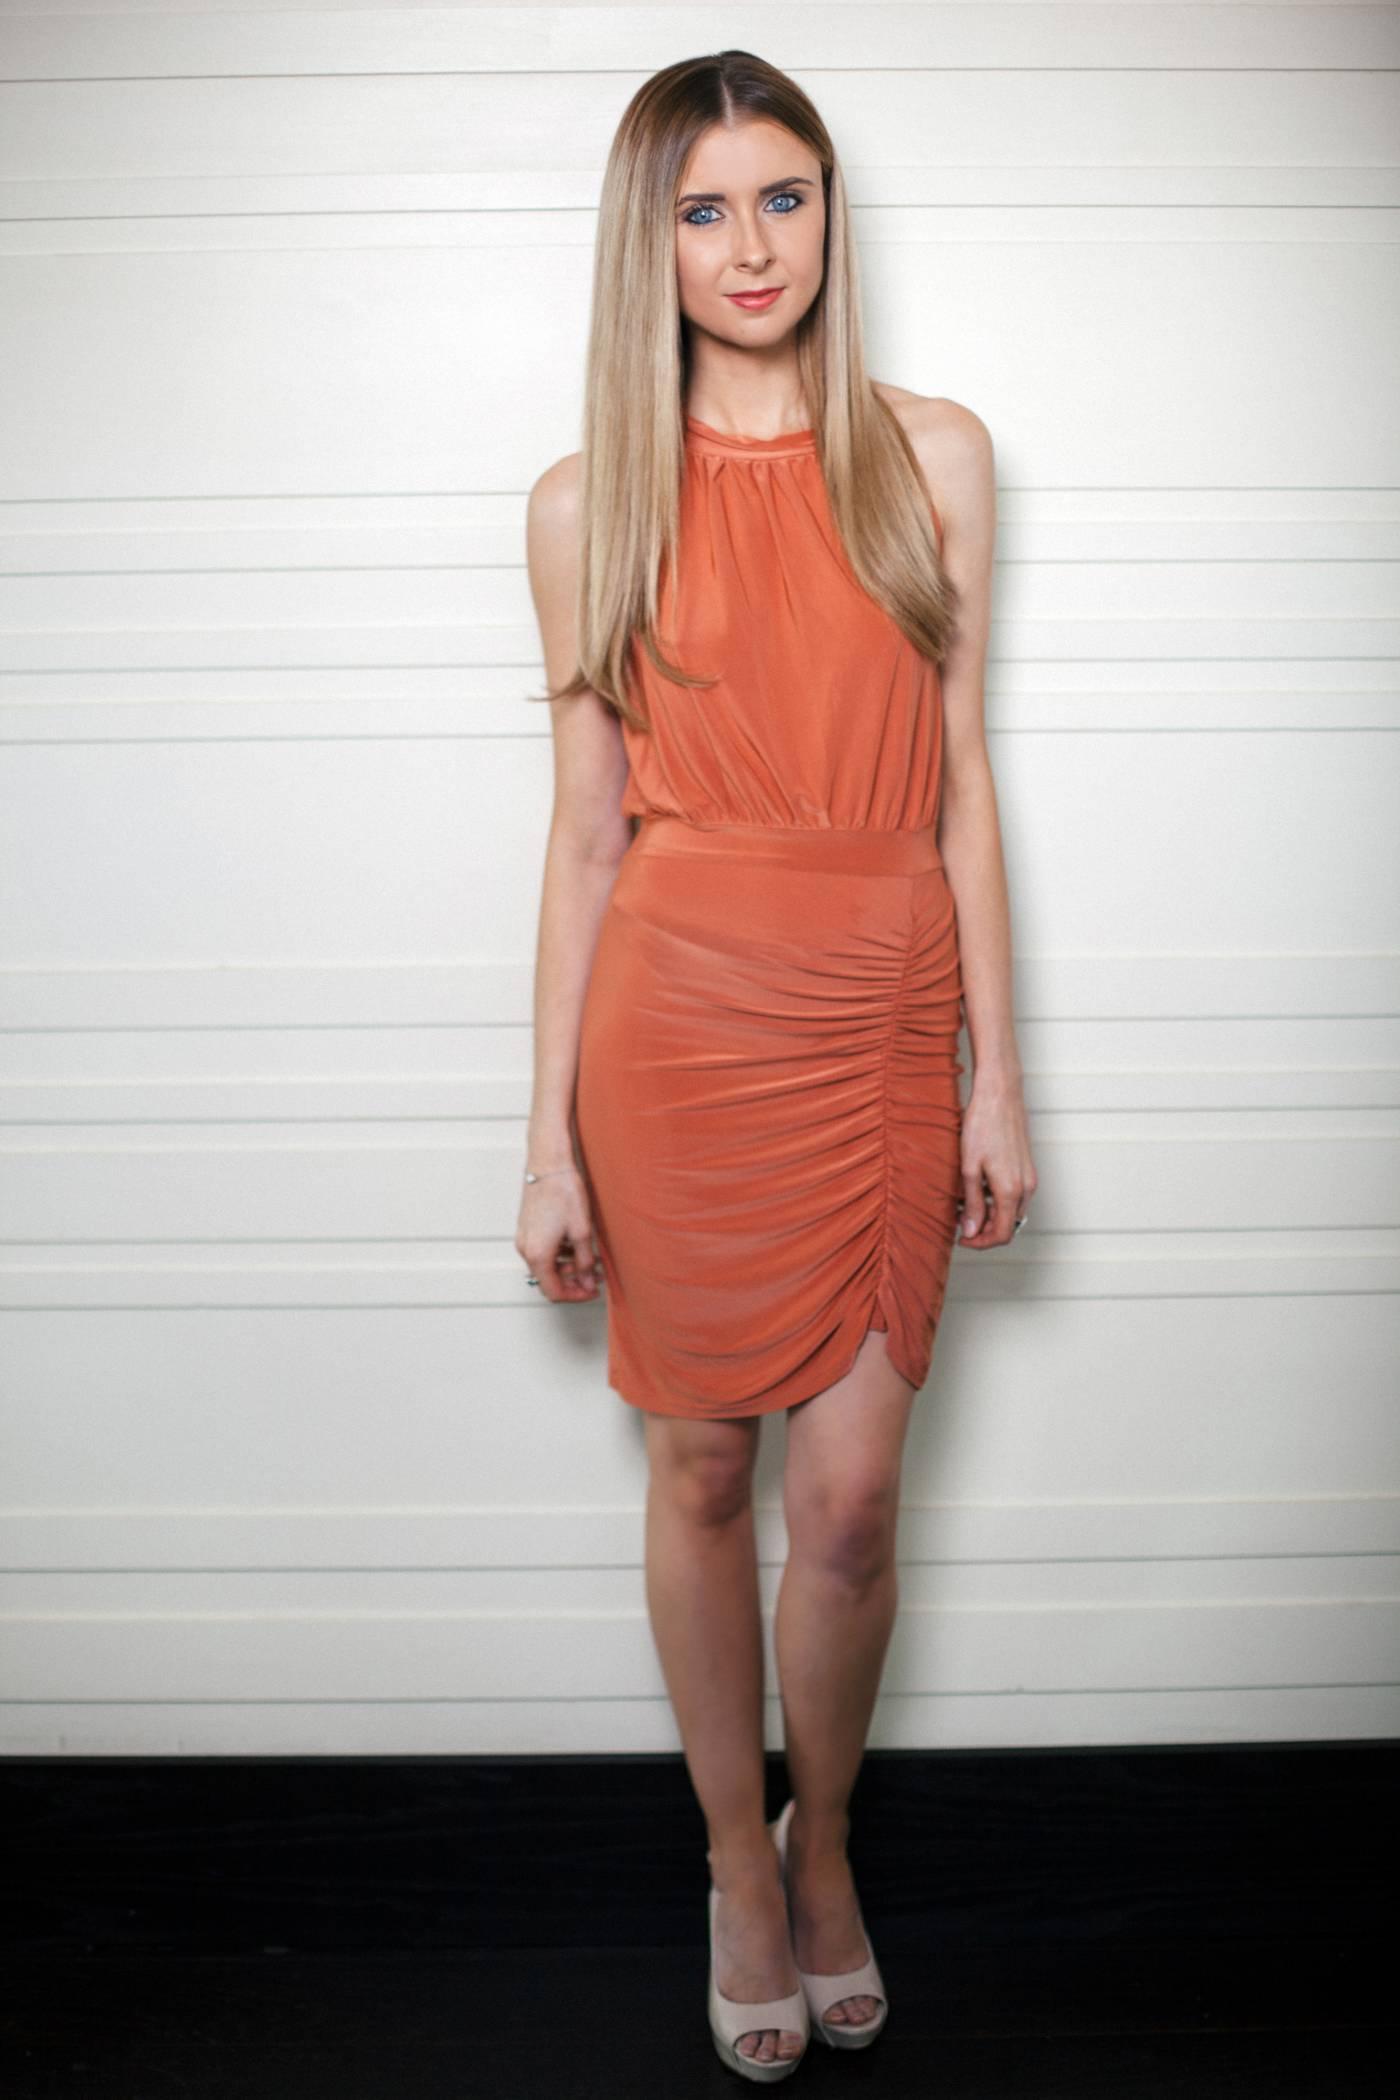 Peaches and Cream Dress